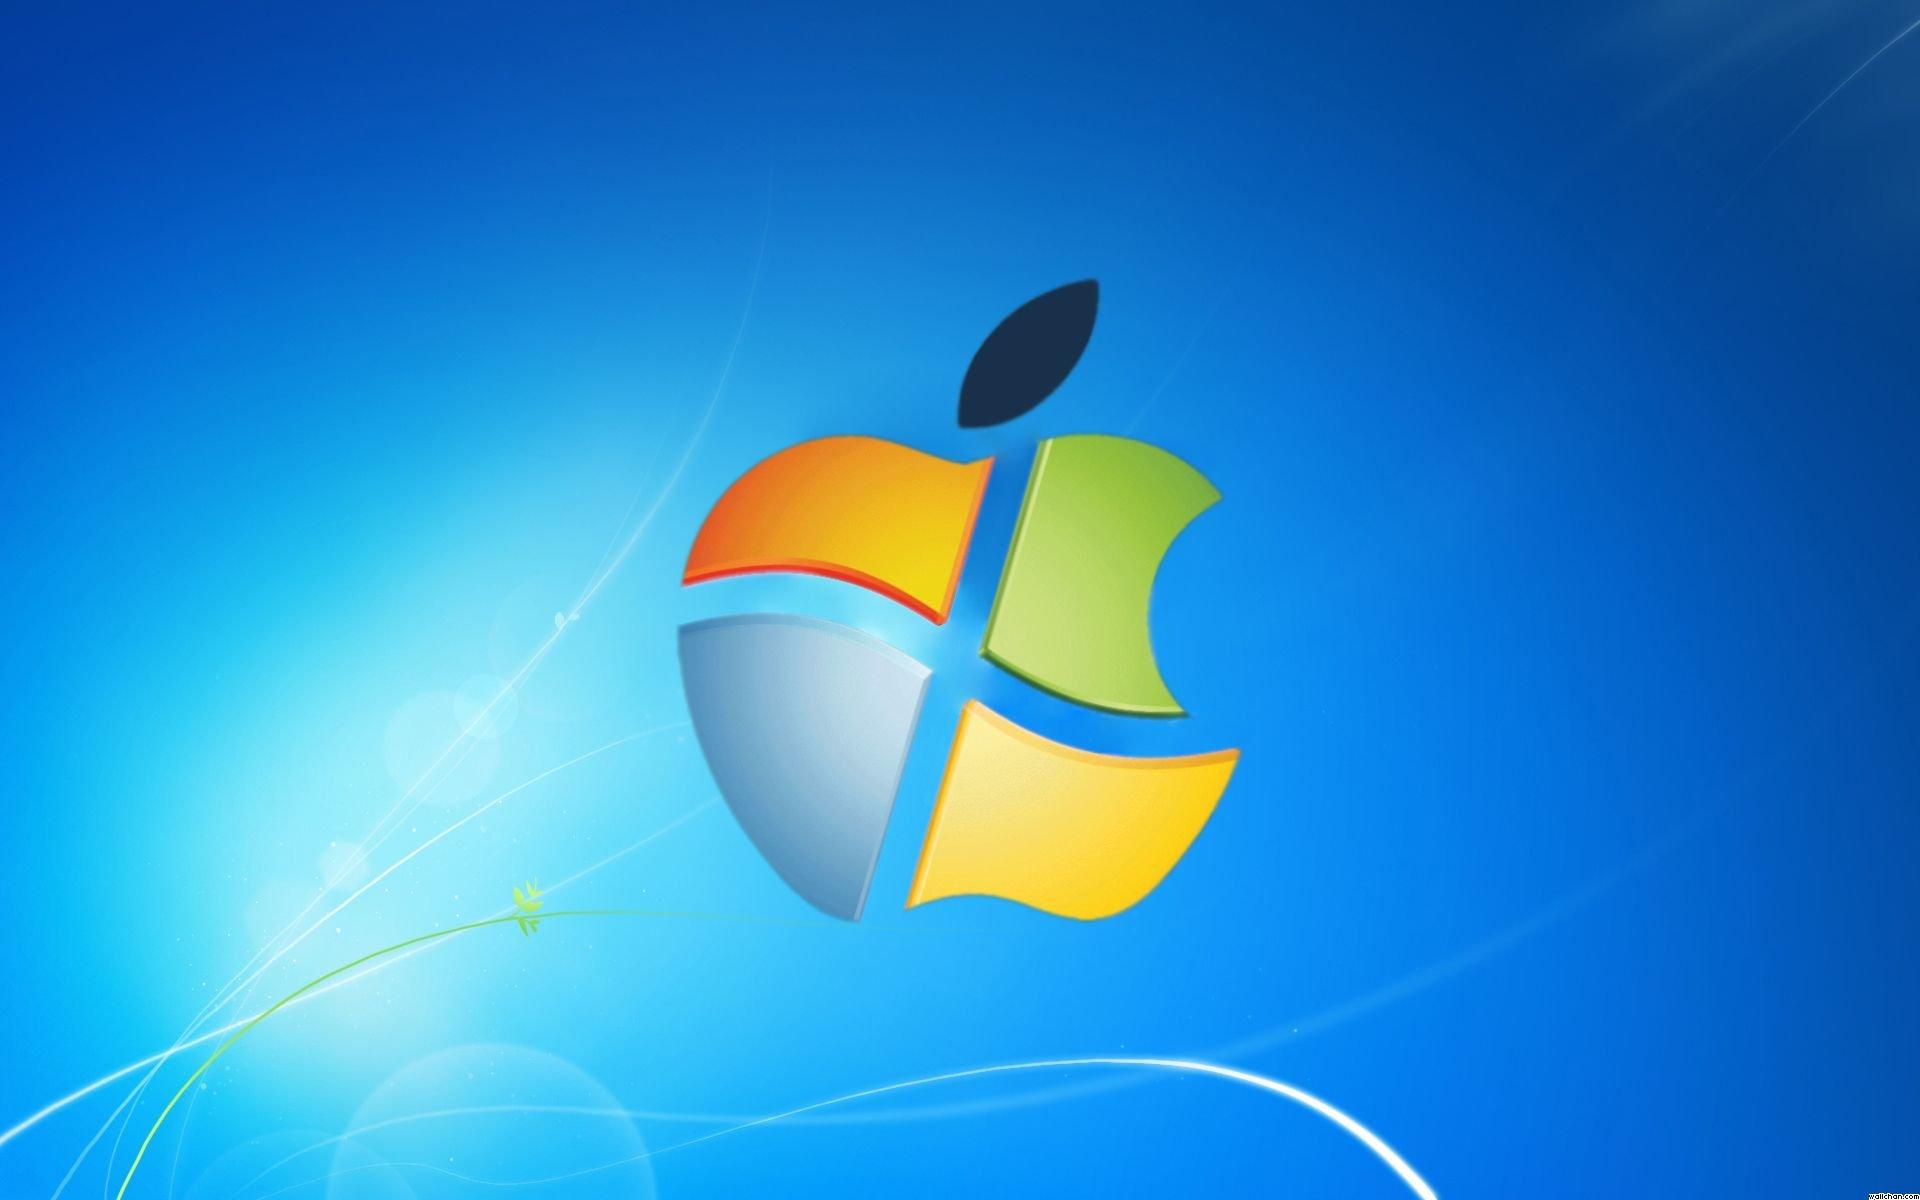 Hd Game Images Desktop Images Windows Apple Background: Mac Wallpaper For Windows